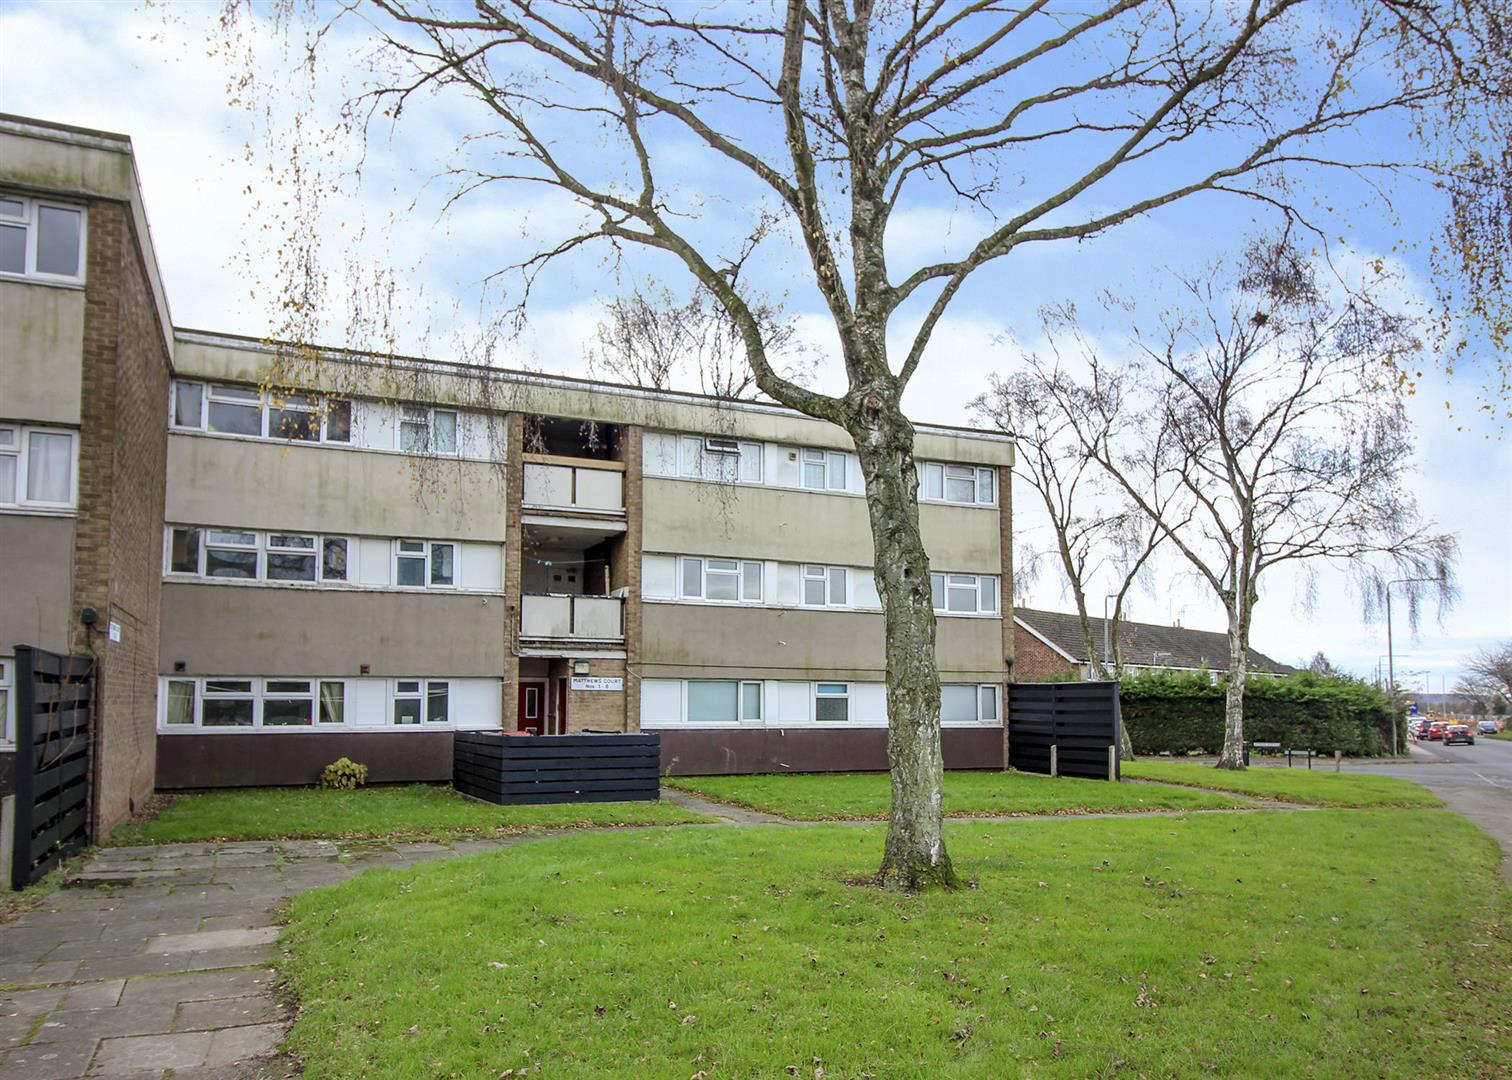 2 Bedrooms Flat for sale in Mathews Court, Stapleford, Nottingham